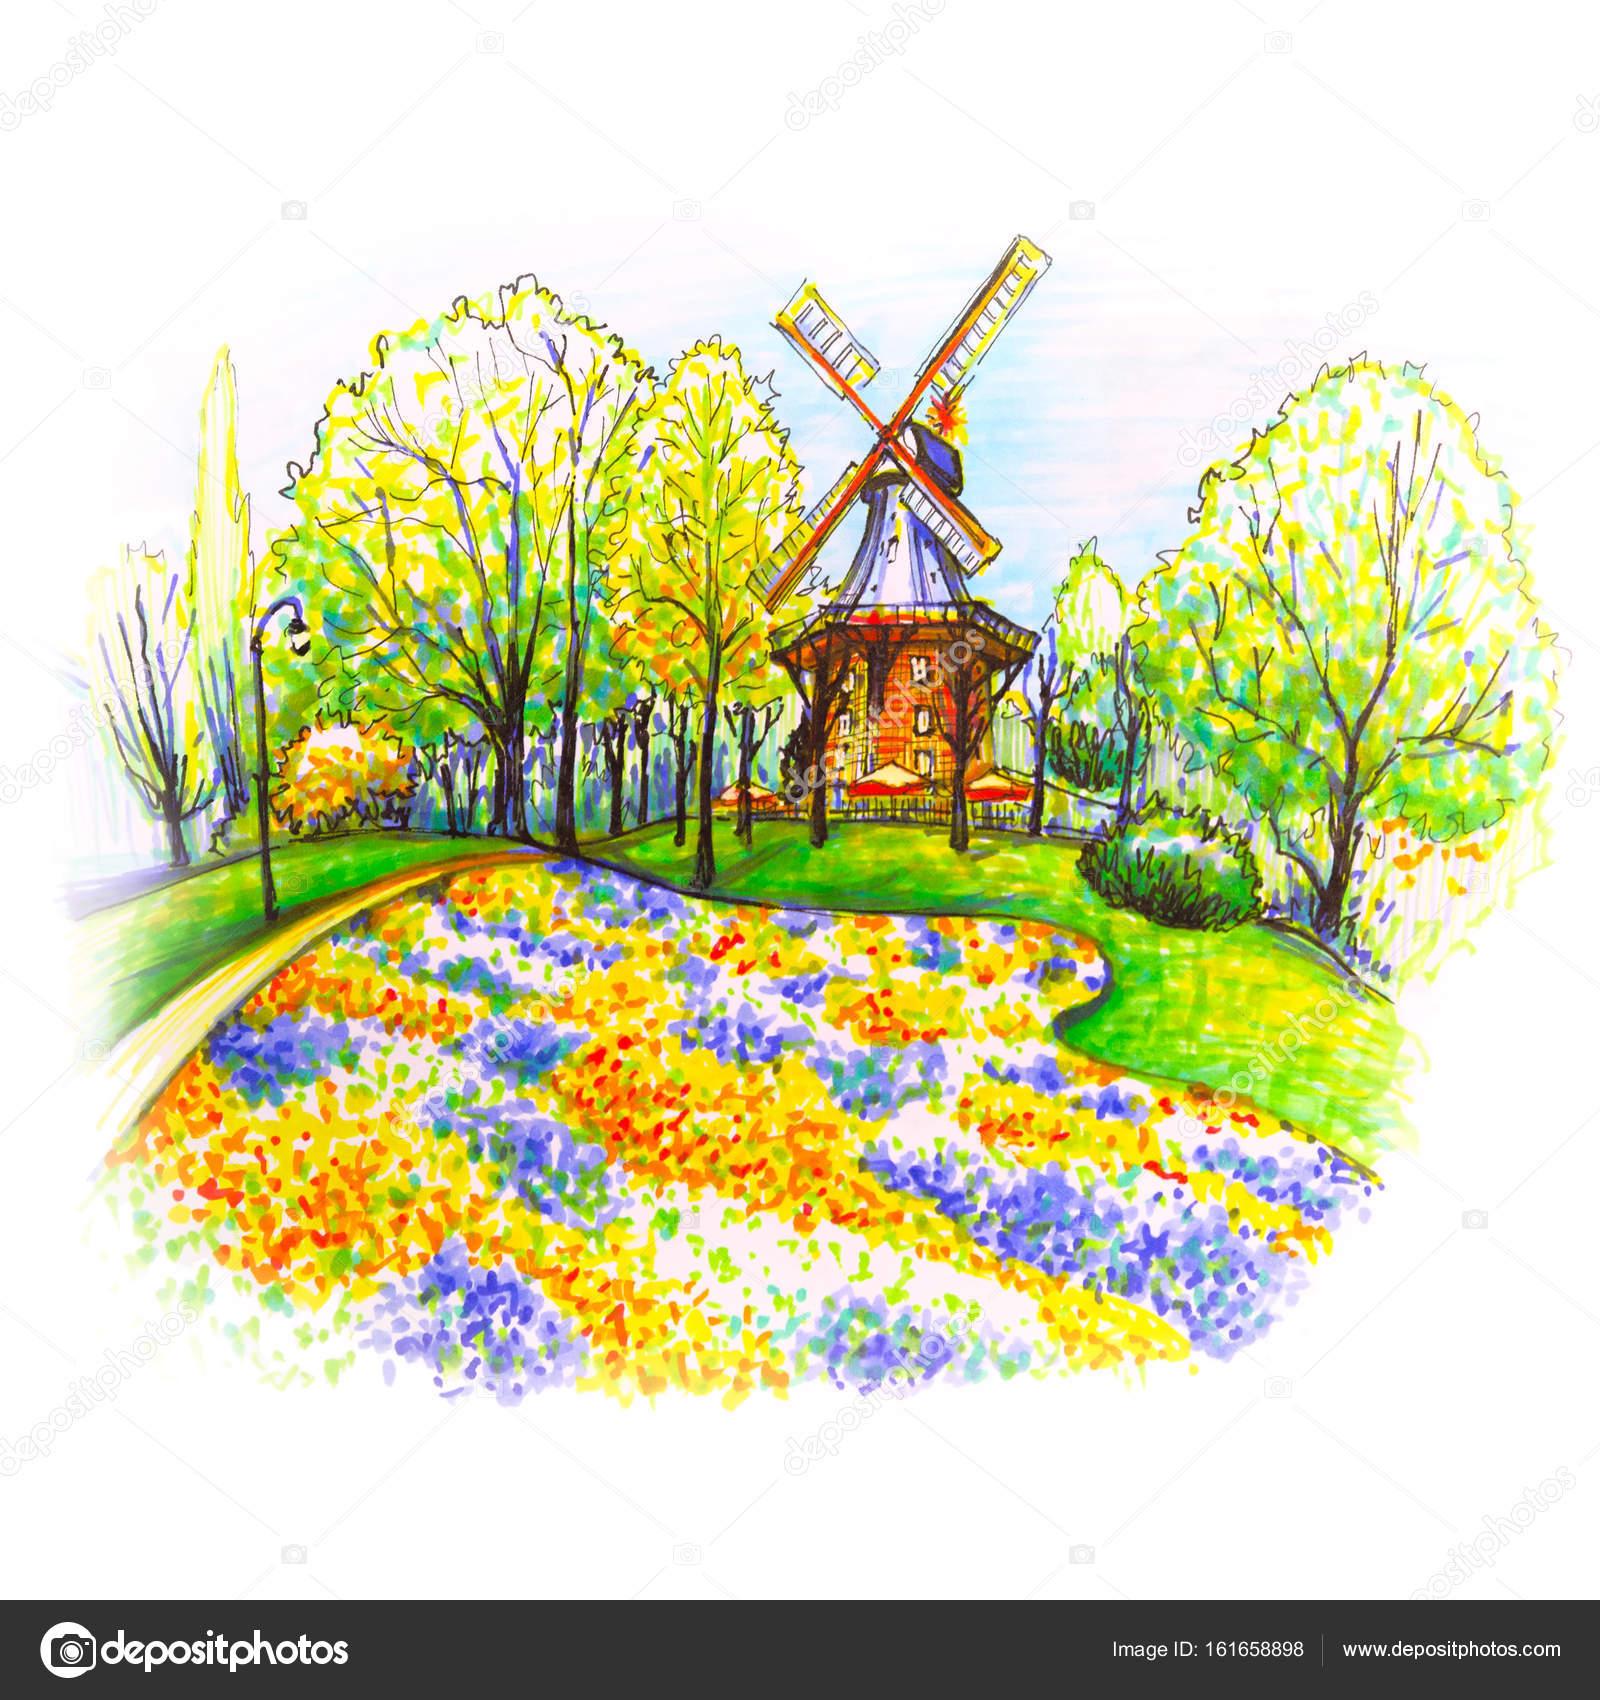 Am Wall Windmill in Bremen, Germany — Stock Photo © olgacov #161658898